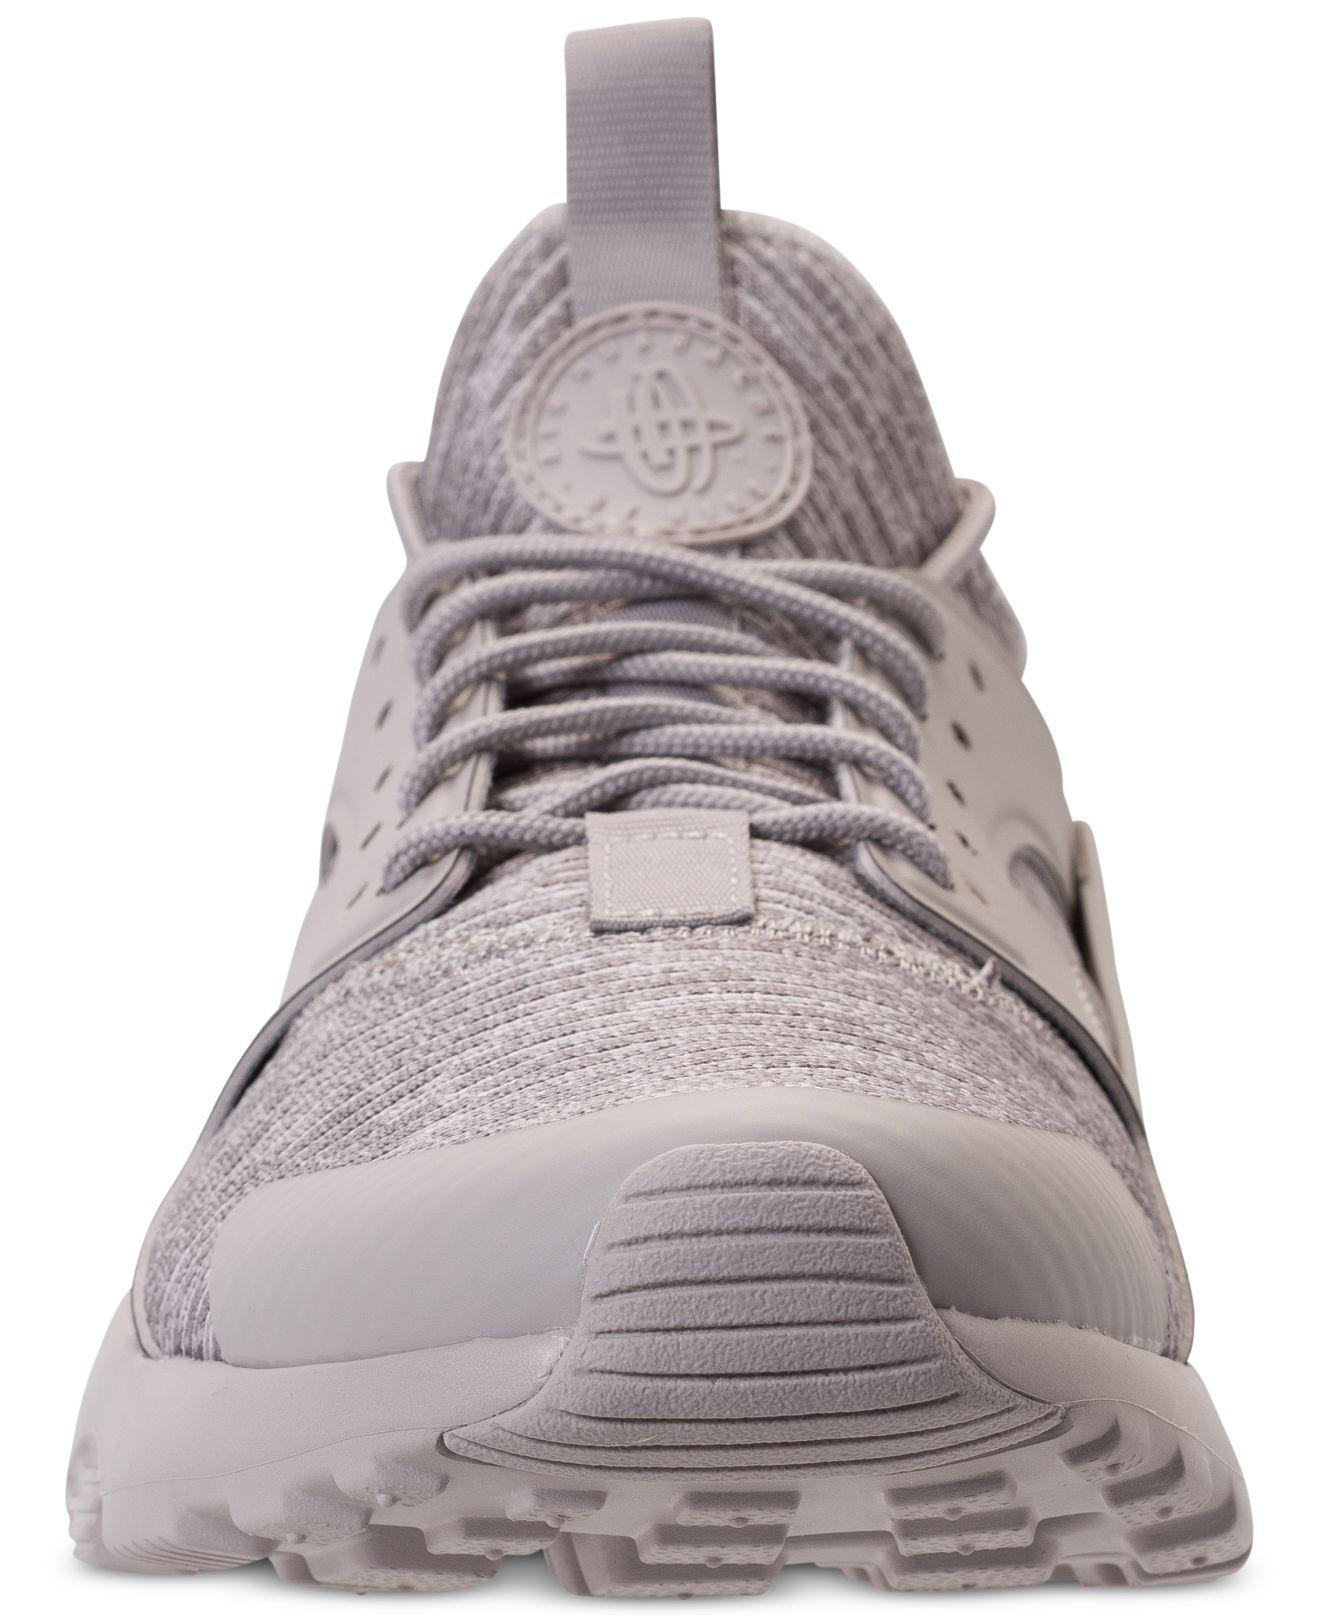 dec7caa6a2273 Lyst - Nike Air Huarache Run Ultra Se Casual Sneakers From Finish ...